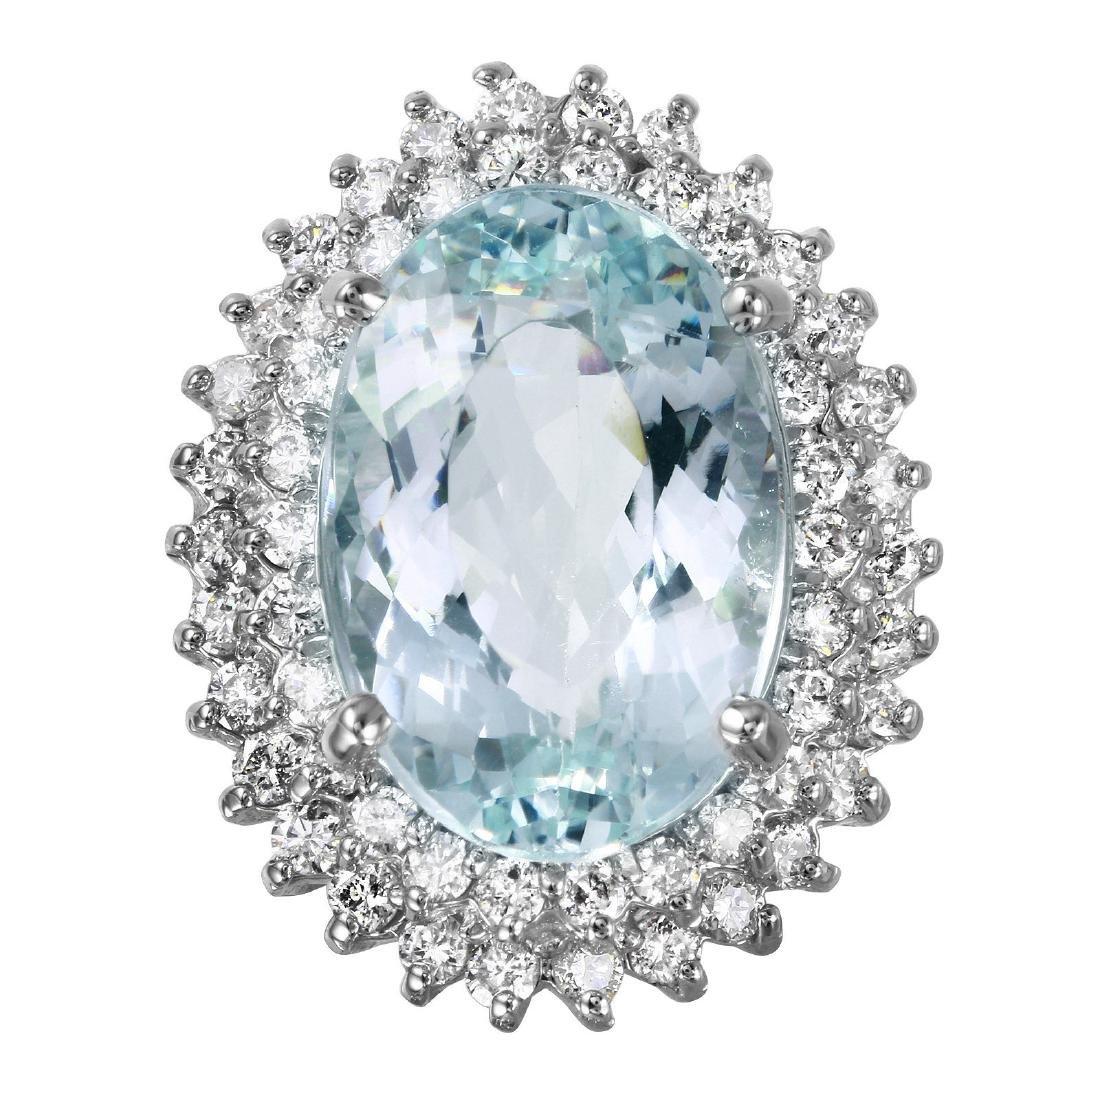 14KT White Gold 11.1ctw Aquamarine Diamond Cocktail - 7